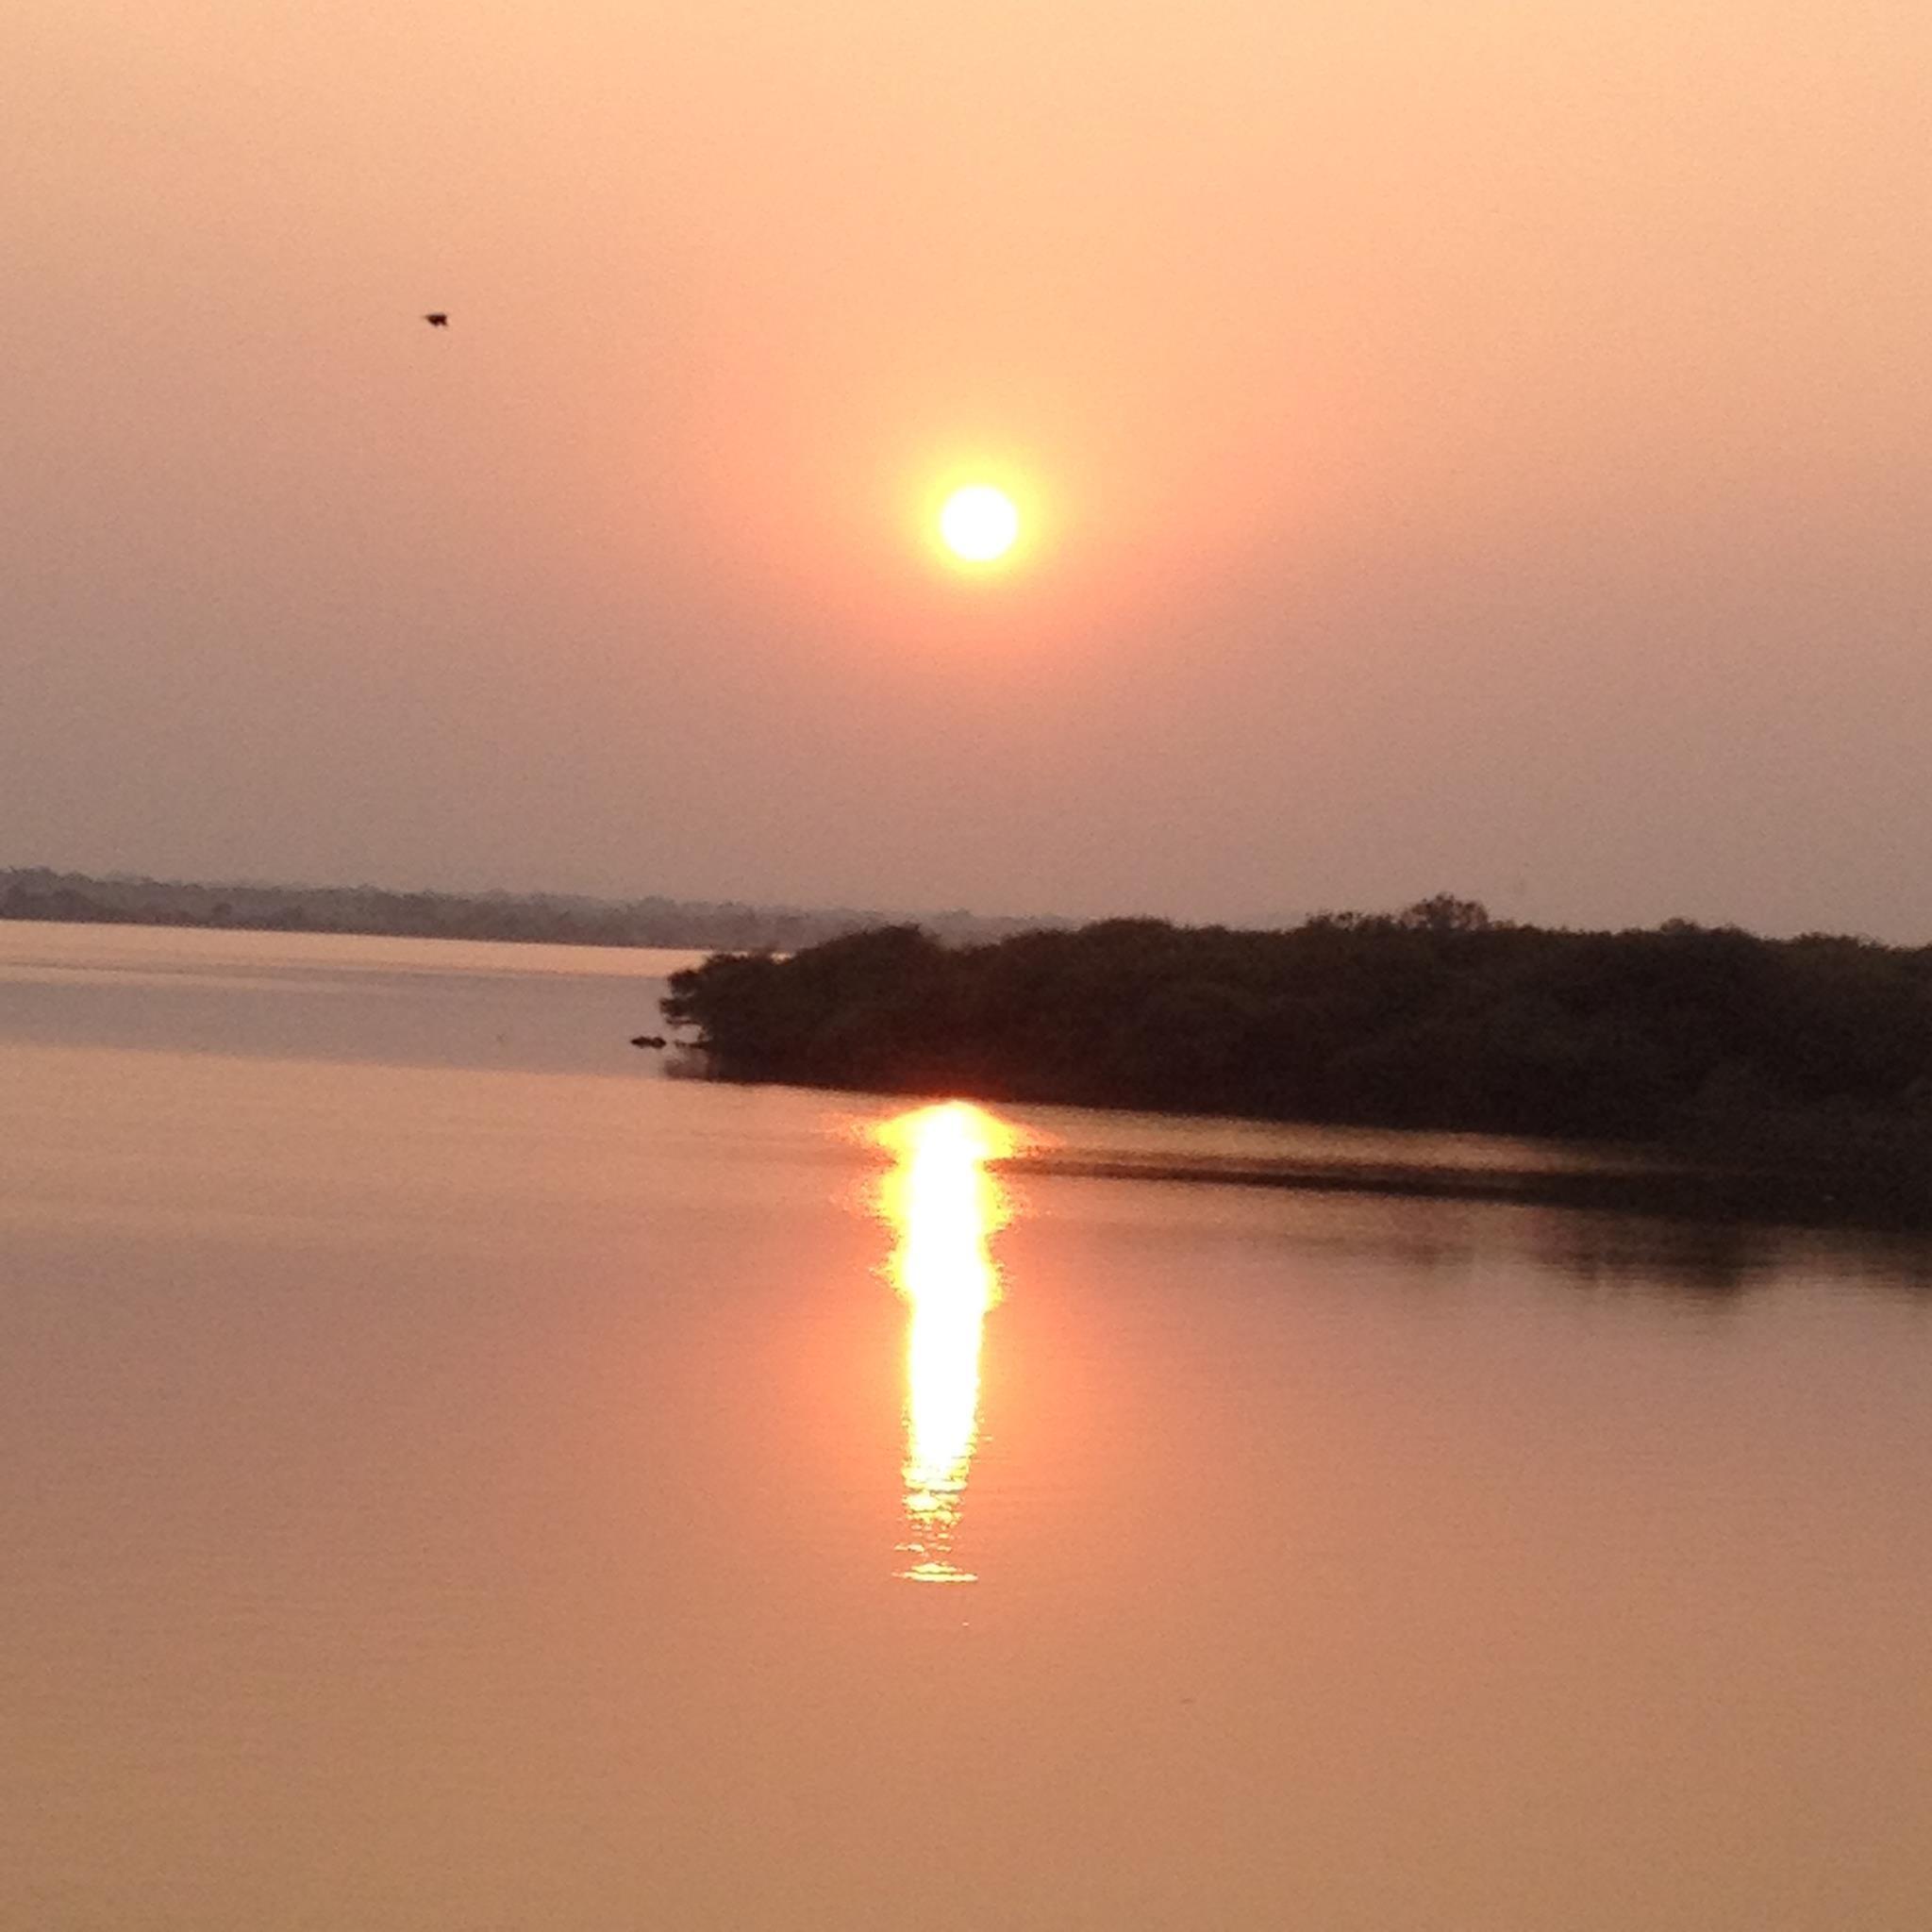 Sunset by Bharat75